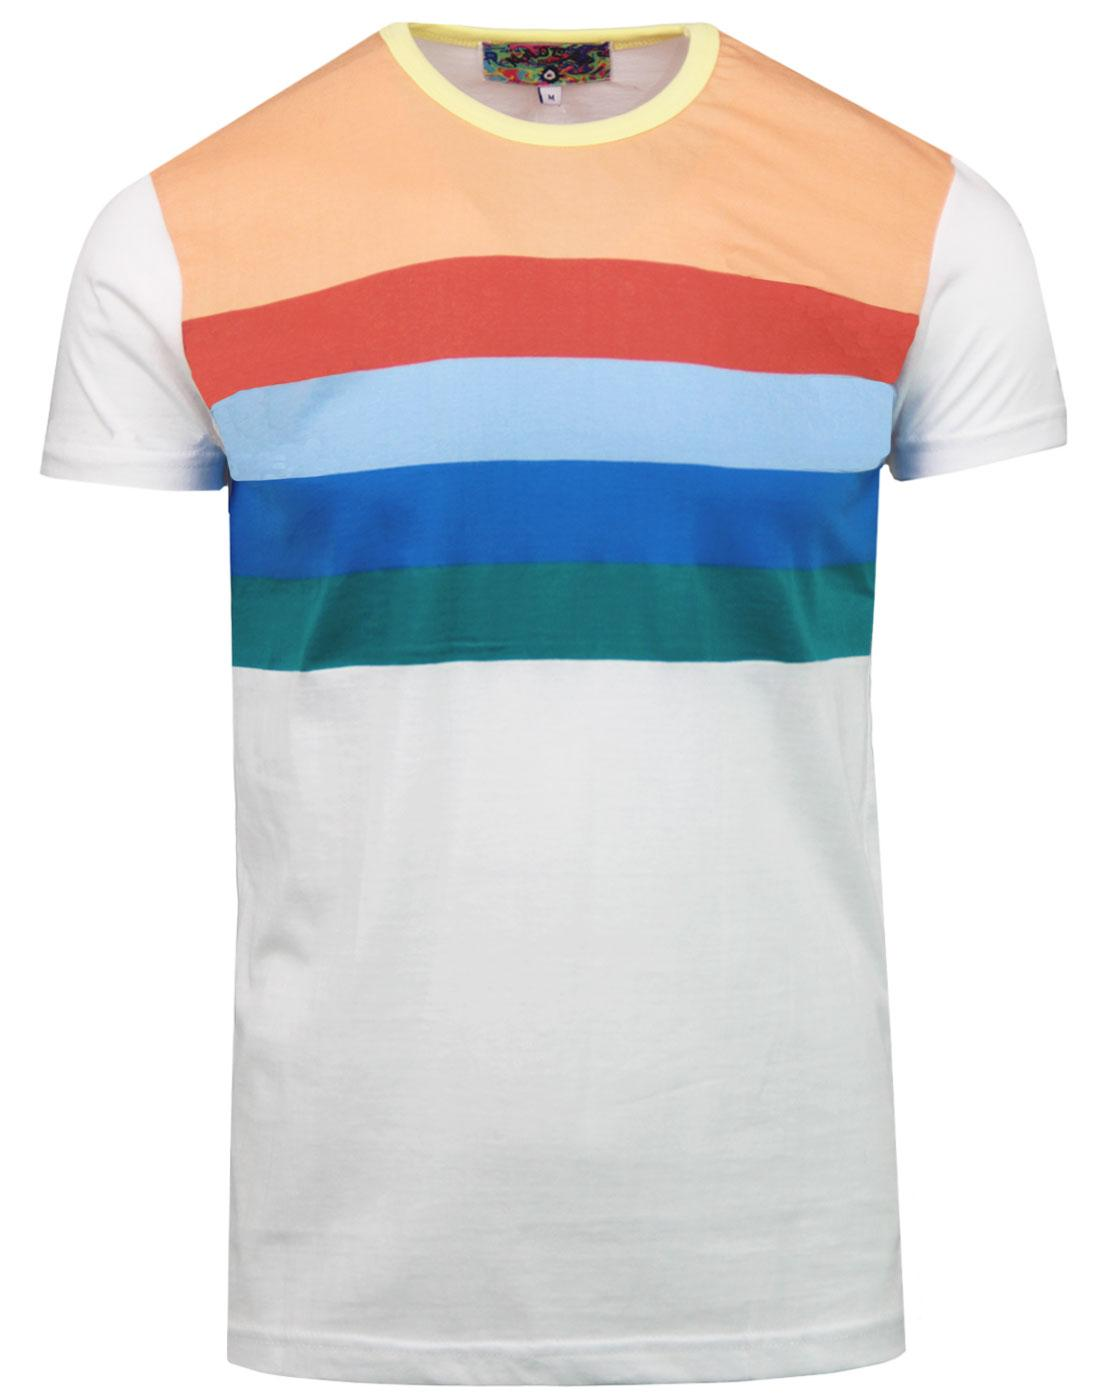 Titan MADCAP ENGLAND Retro Rainbow Stripe T-shirt